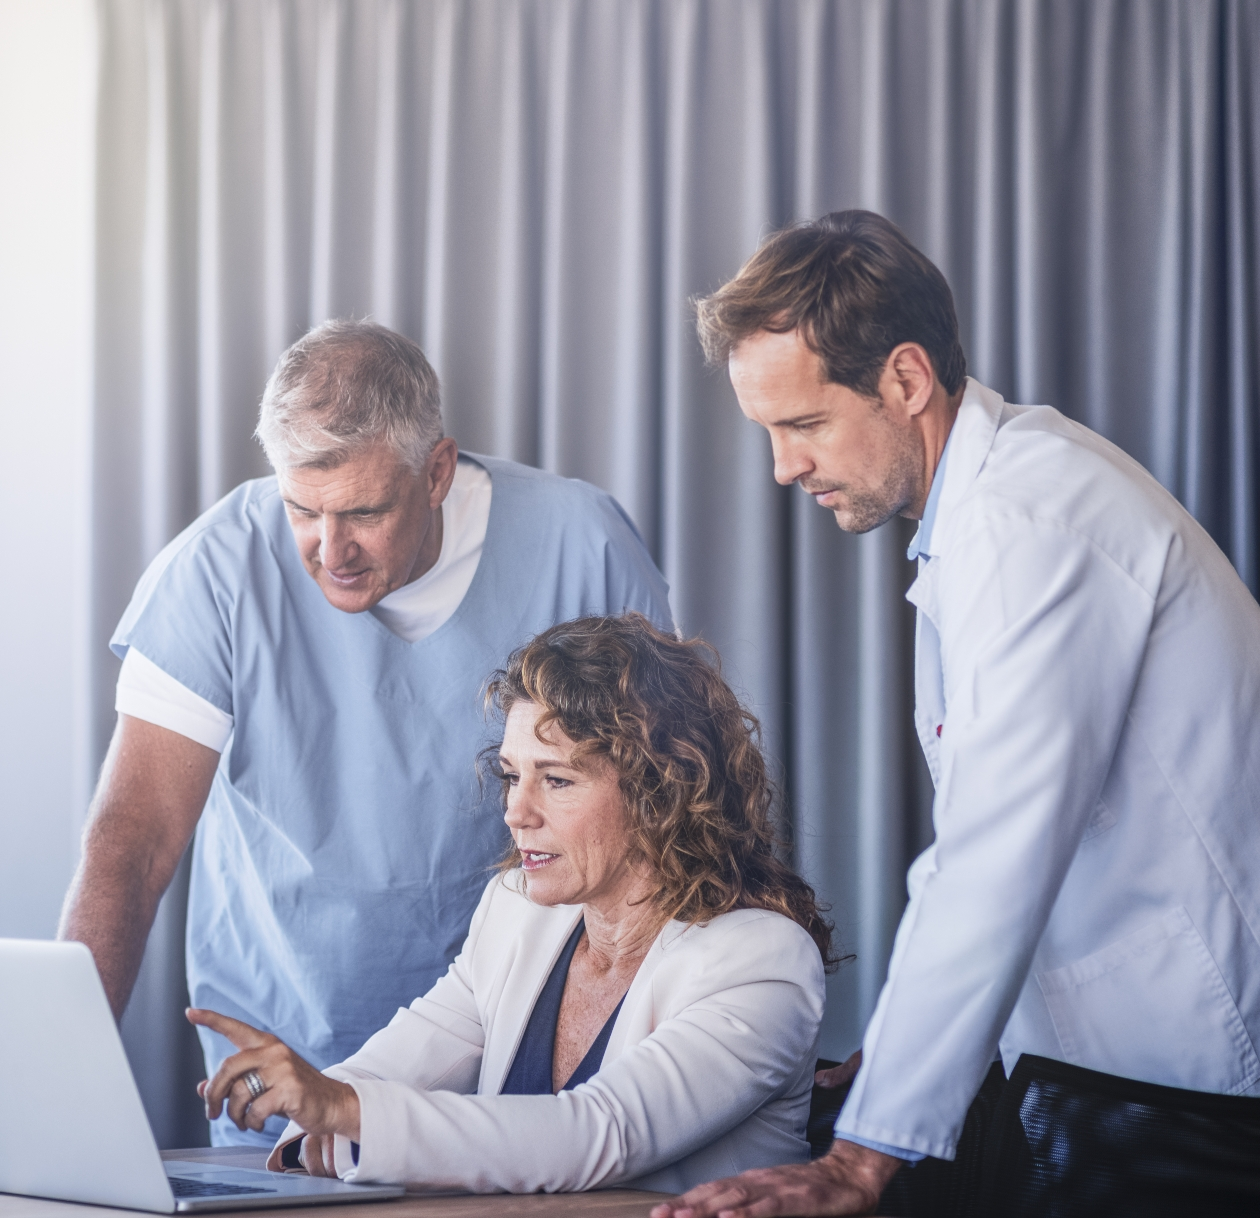 Data Management Platform for Utilization Management Organization@2x